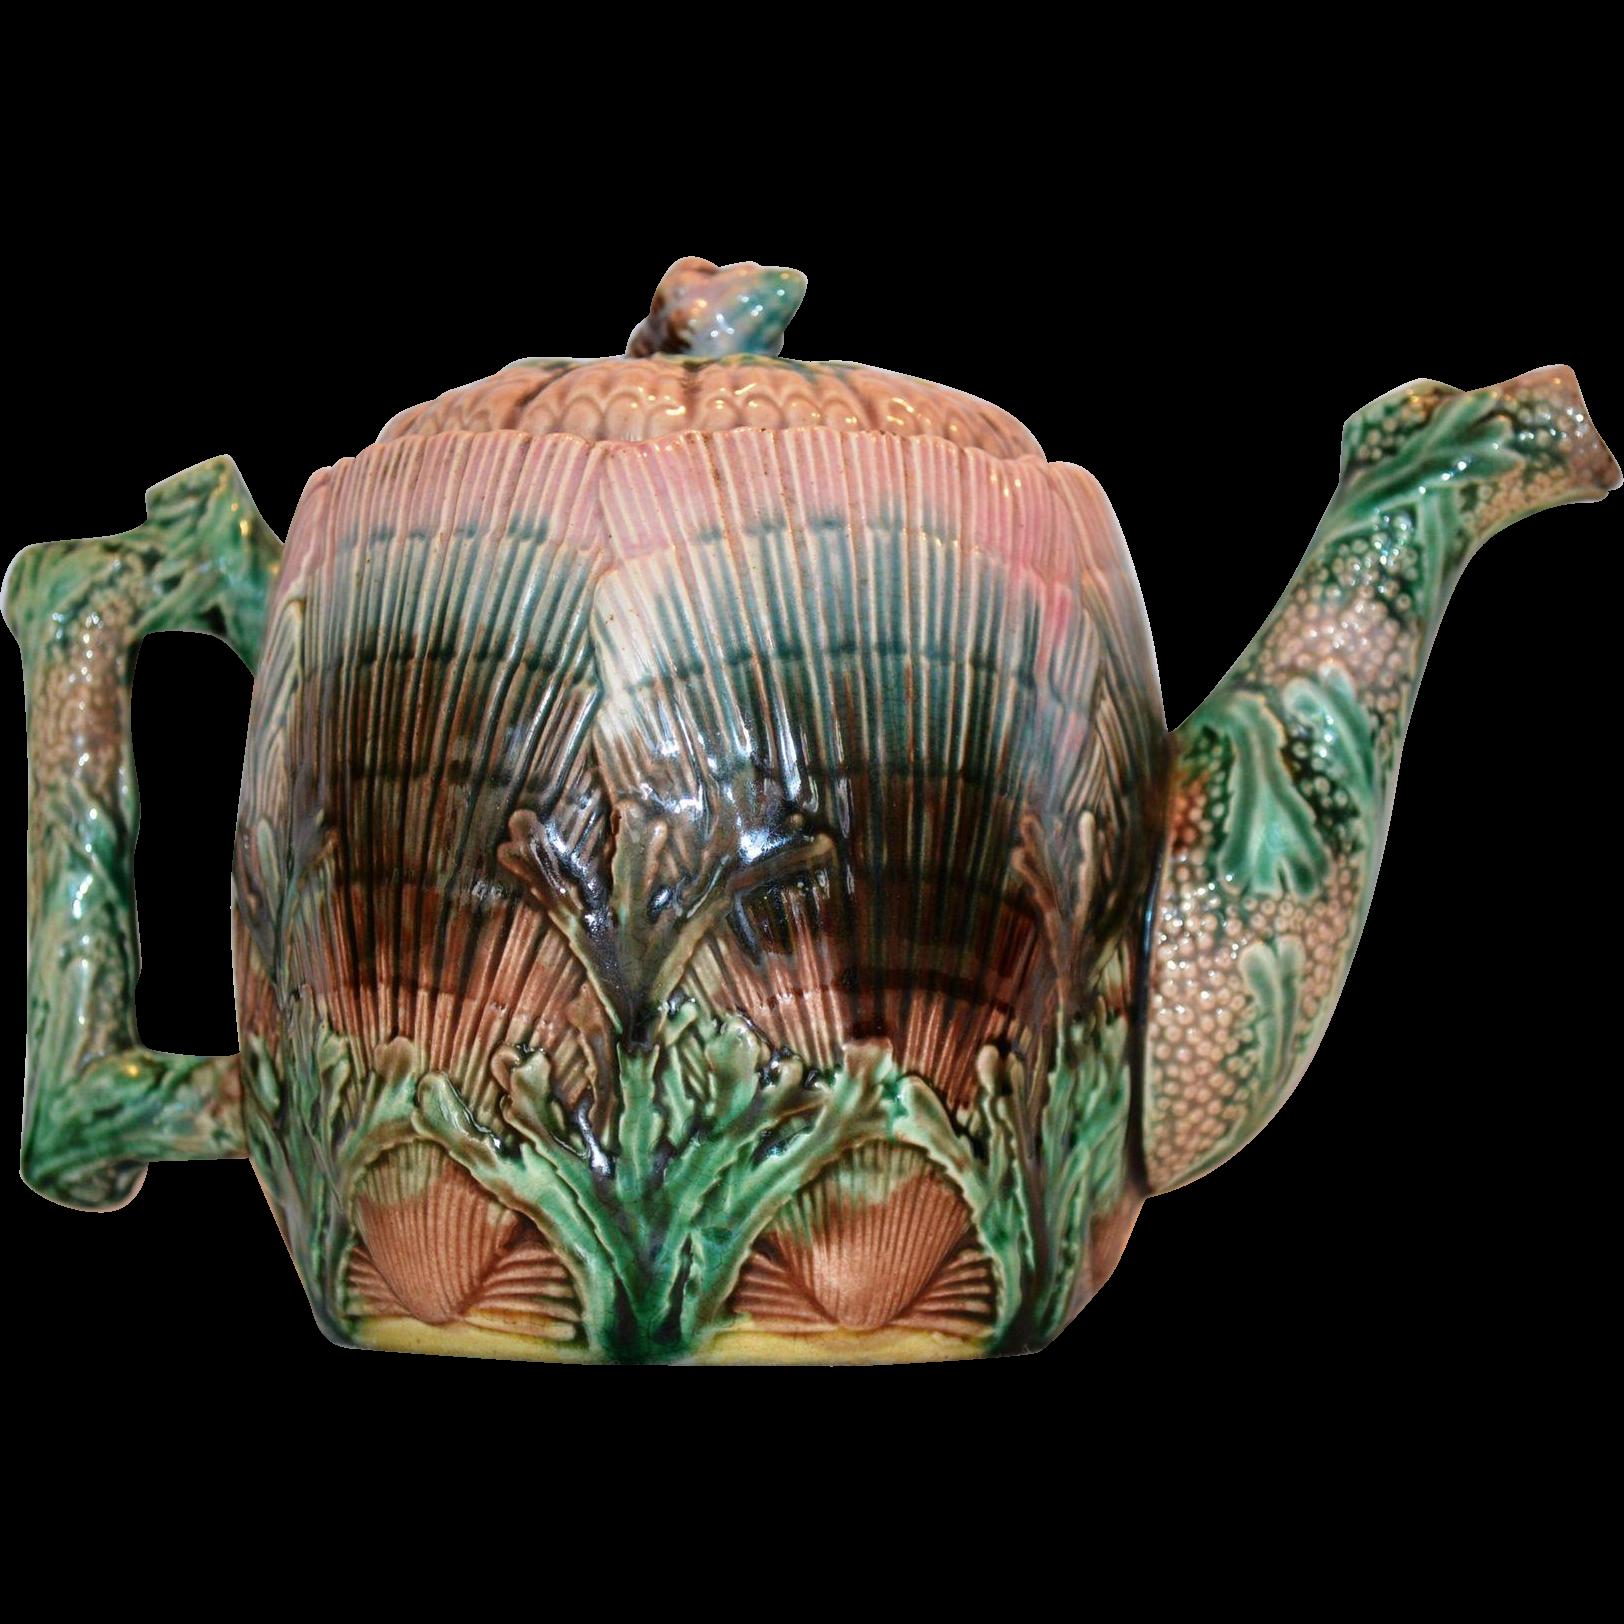 Teapot ~Etruscan Majolica ~ Seaweed / Seashell~ Griffen, Smith, Hill ~ Phoenixville, PA 1879-1892